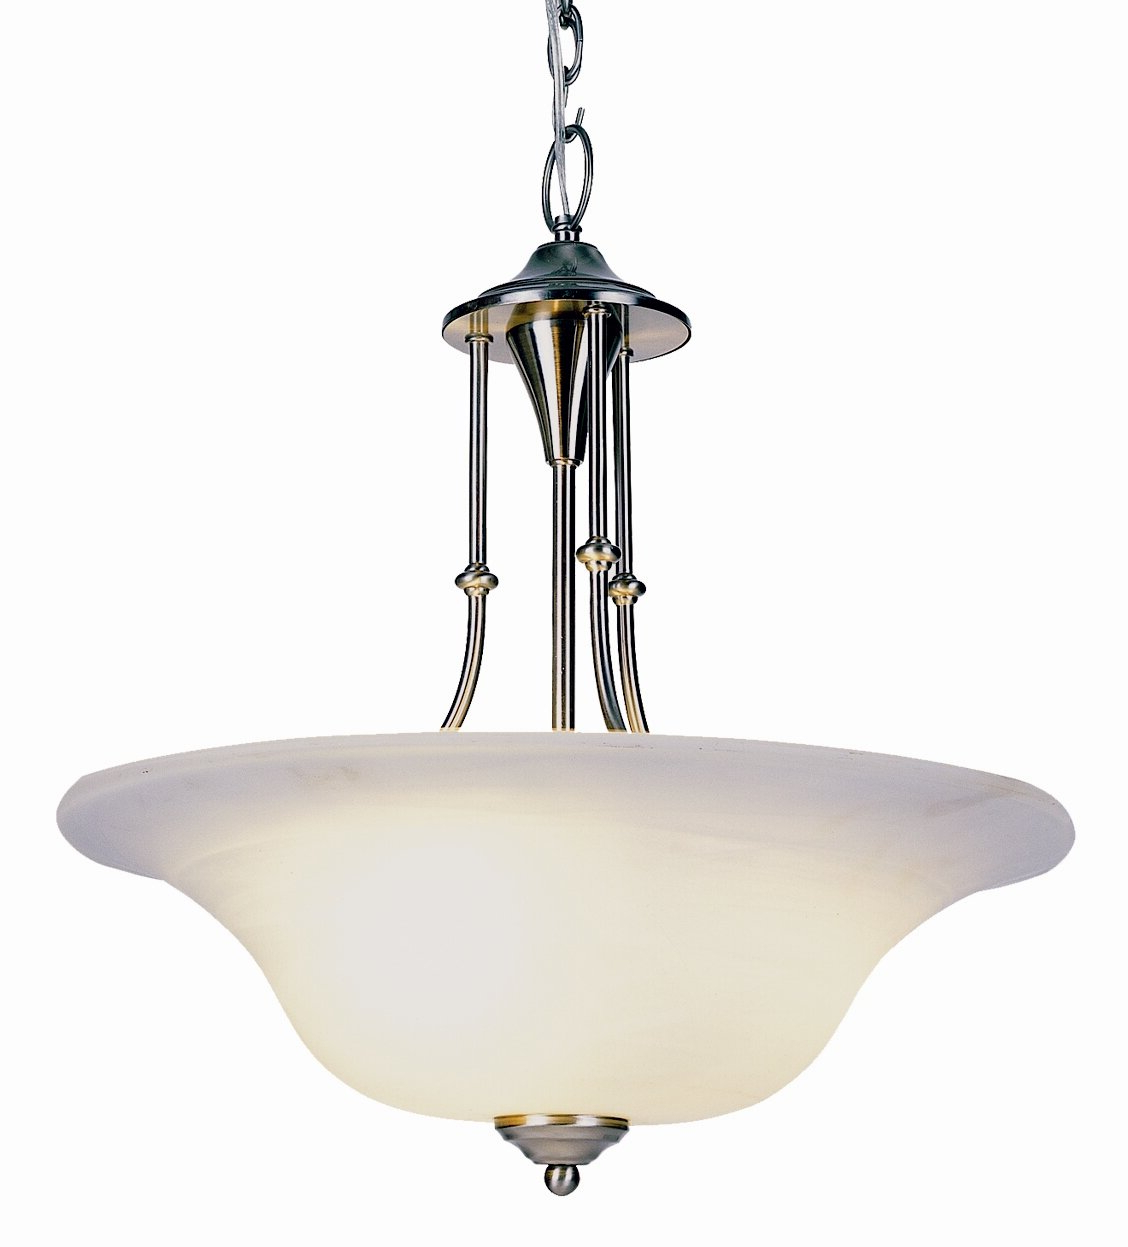 Newent 3 Light Bowl Pendant Regarding Latest Newent 3 Light Single Bowl Pendants (View 12 of 25)